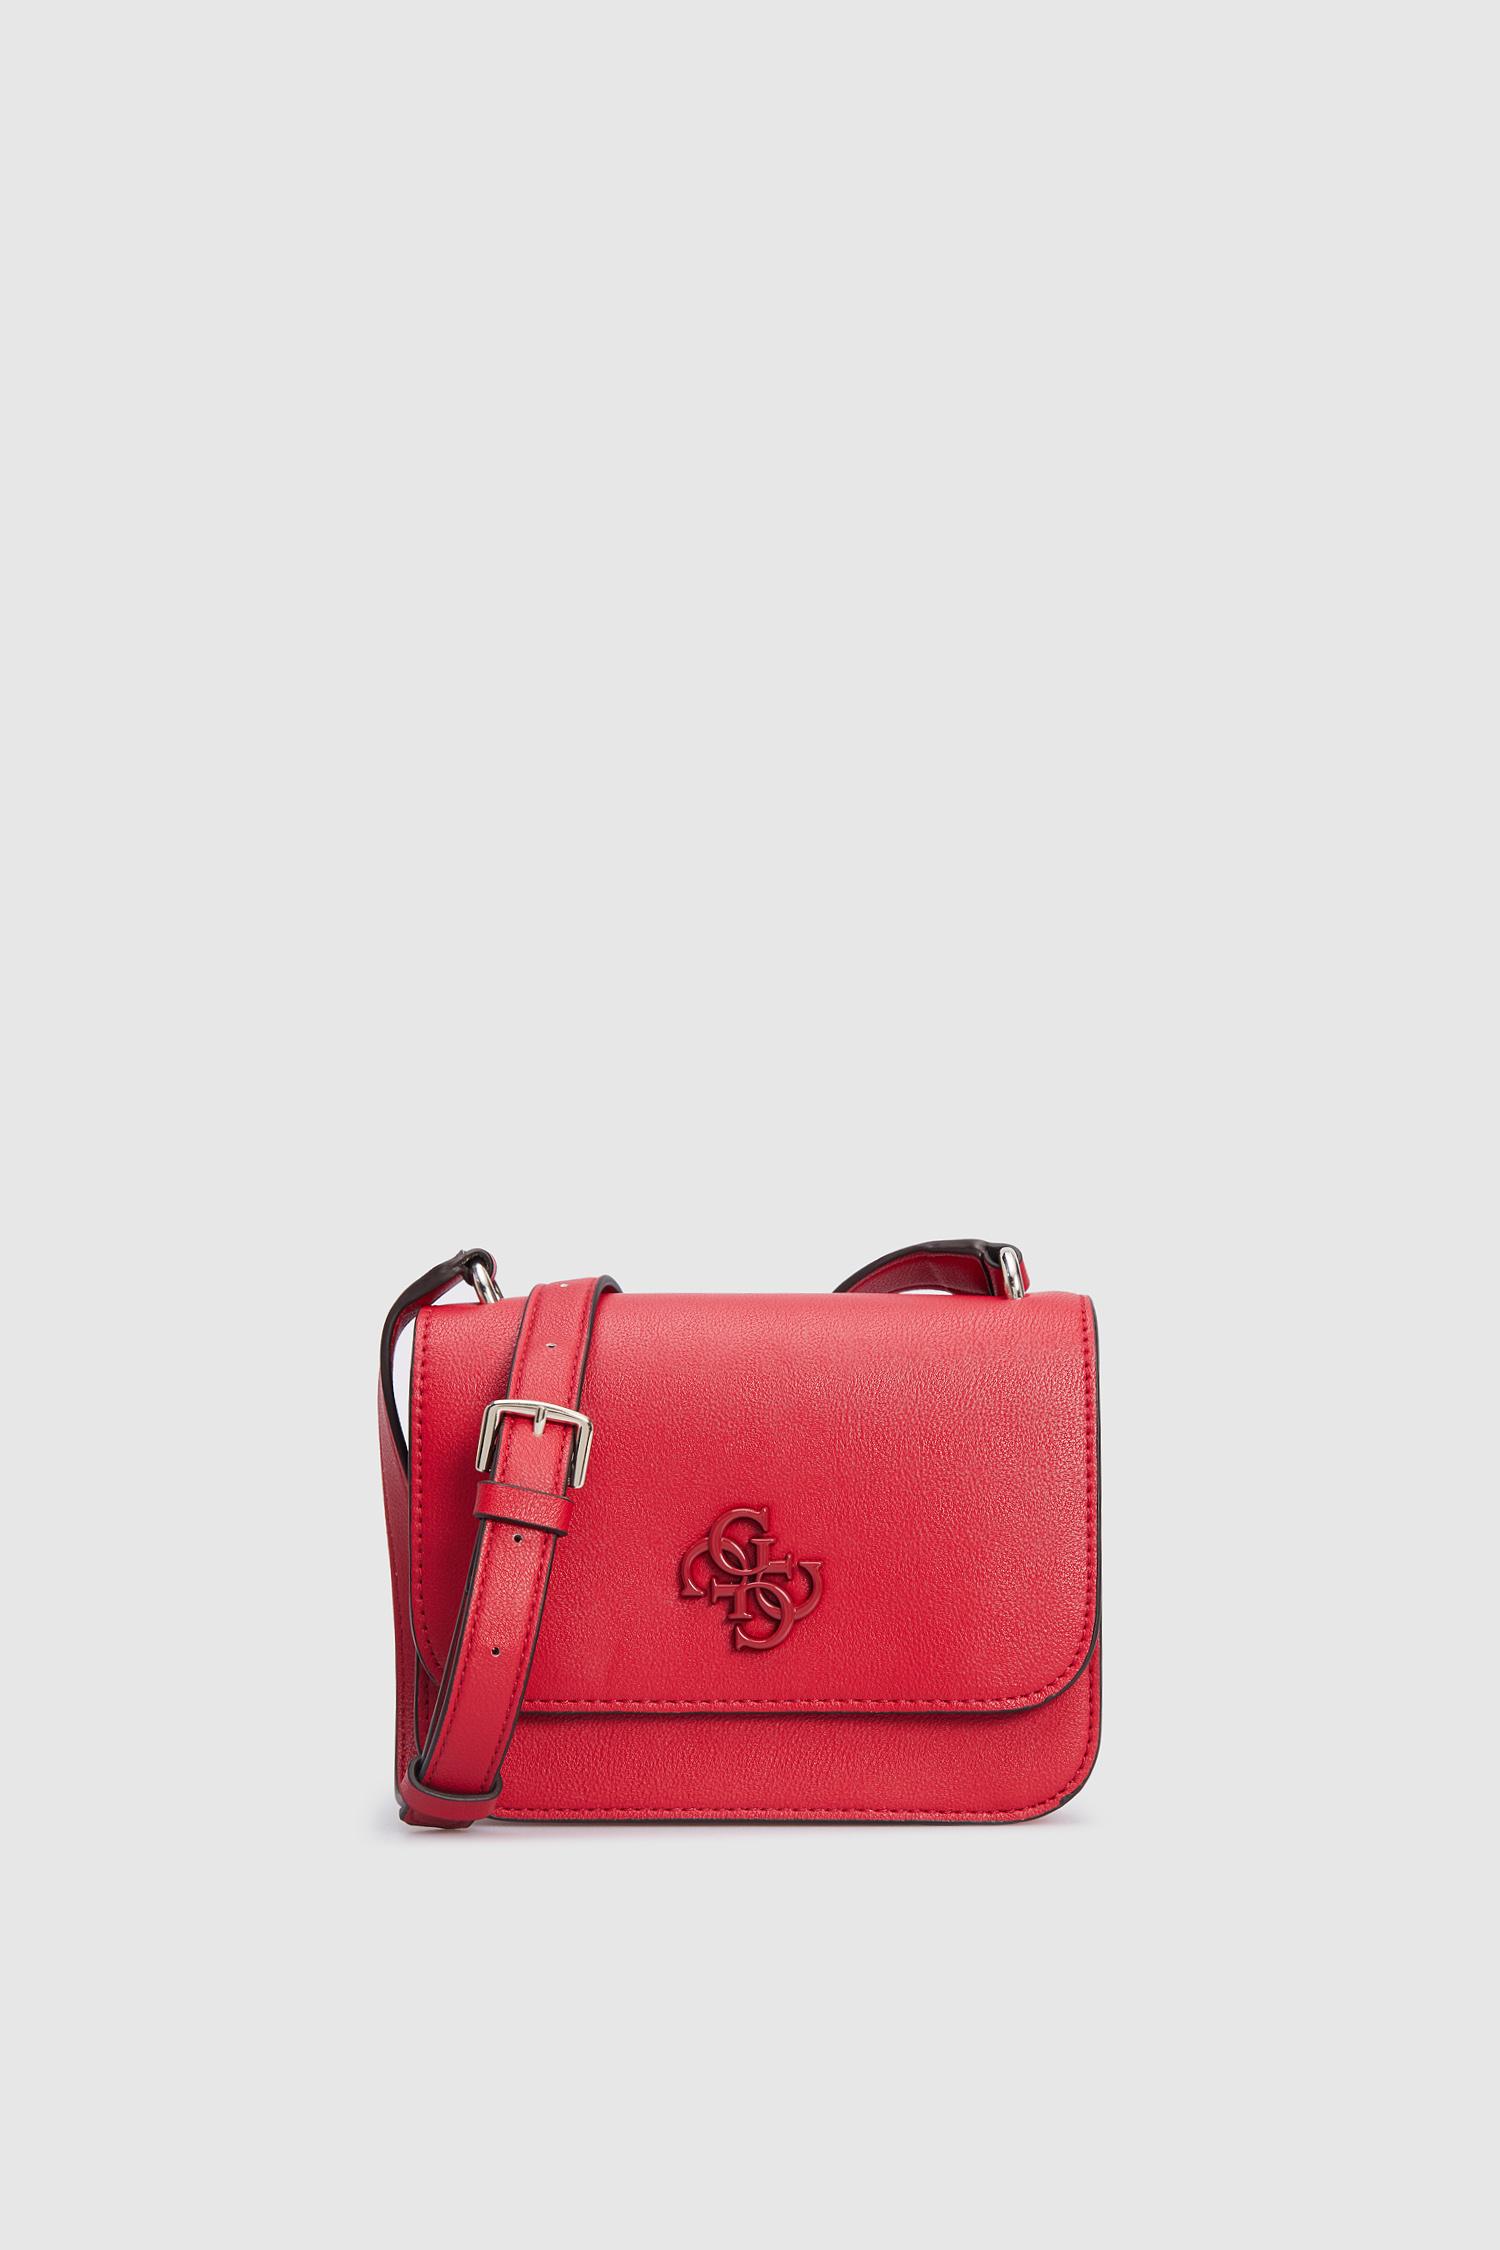 Женская красная сумка через плечо Guess HWVE78.79780;RED